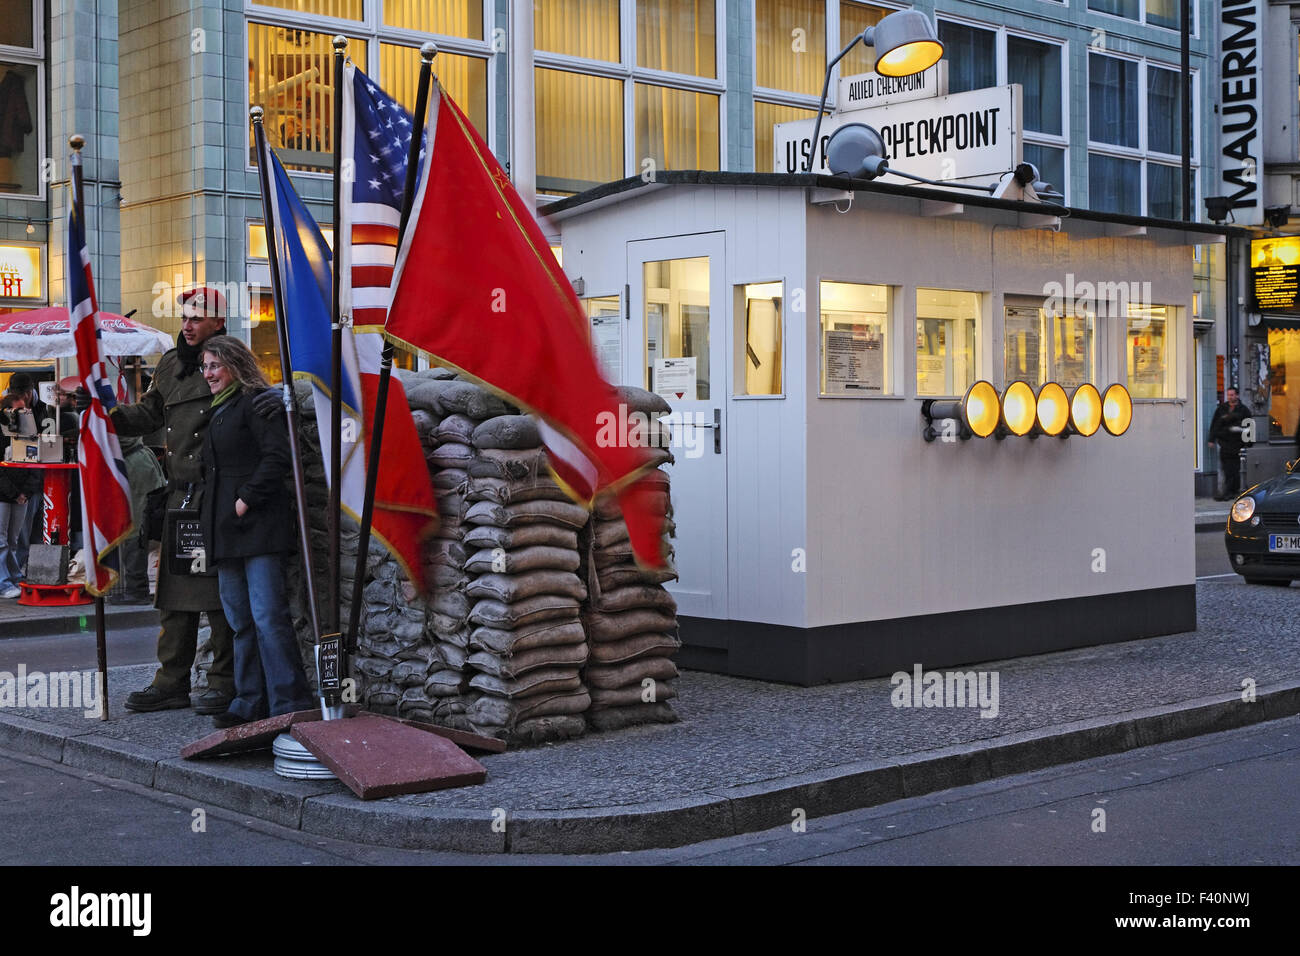 Sentry o ver la cabina en Checkpoint Charlie Imagen De Stock